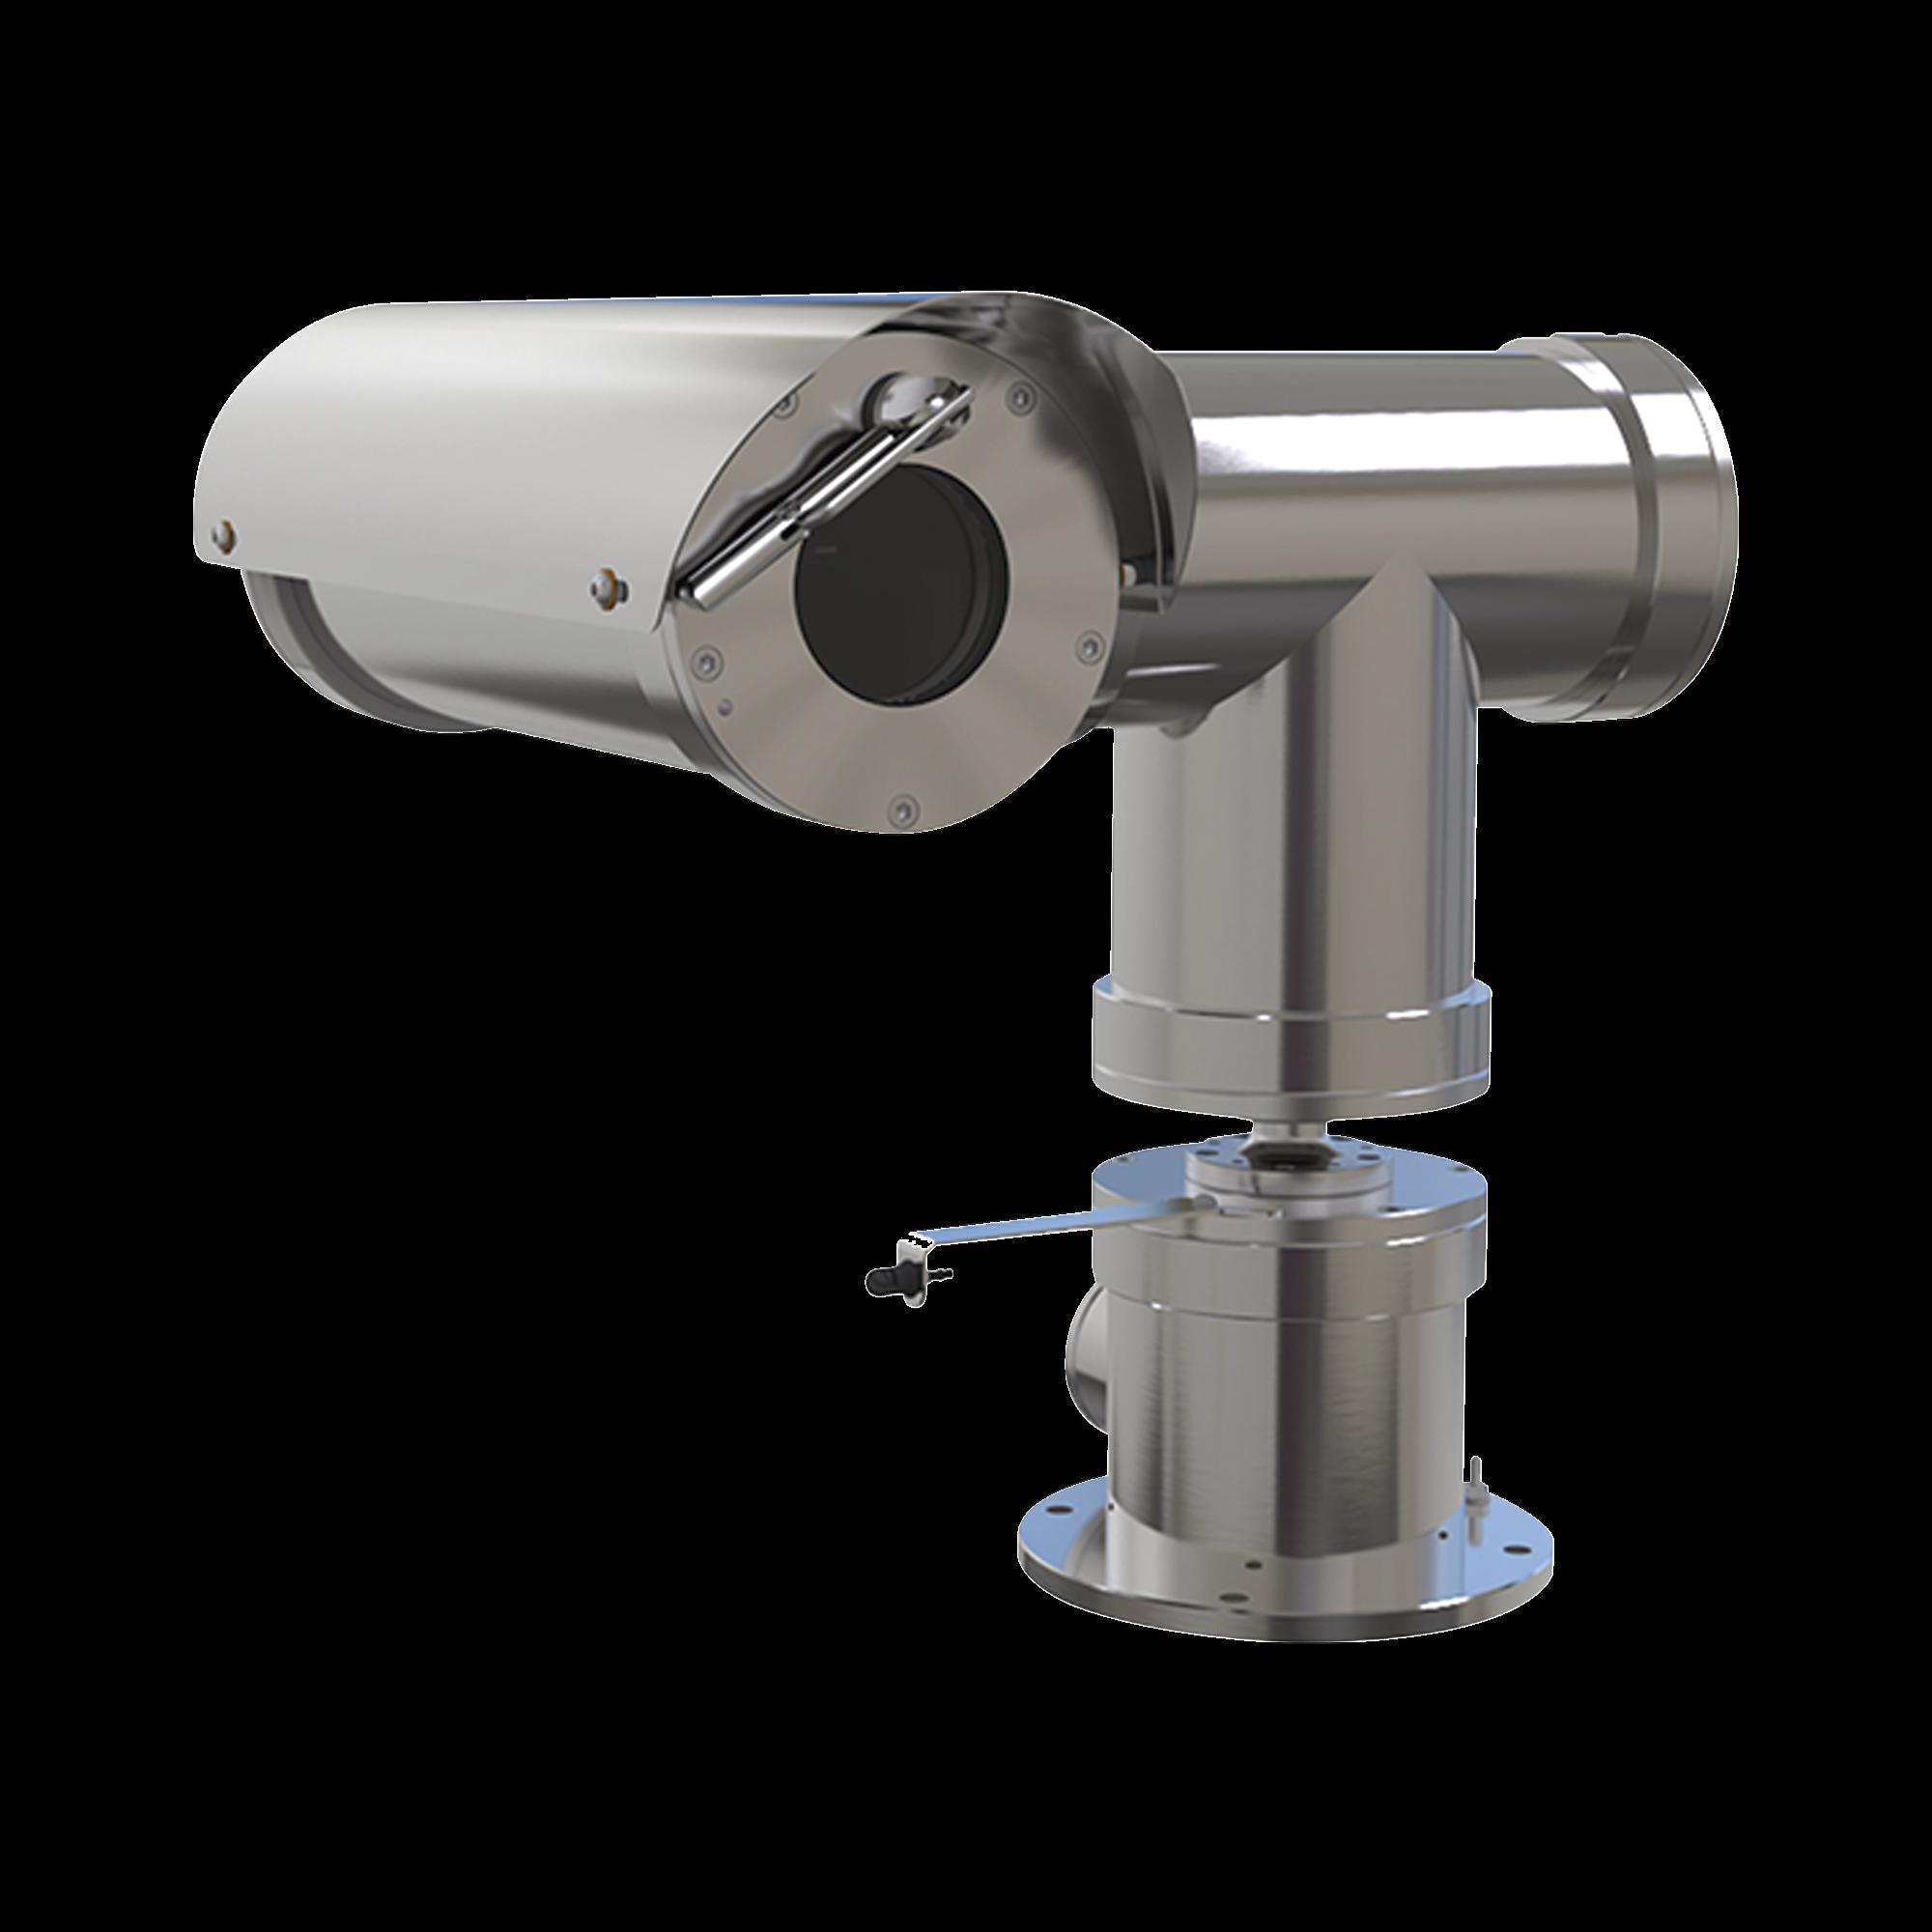 Camara IP PTZ  antiexplosion 2MP, 32X, IP68, WiseStream II / con wiper / acero inoxidable / conexión de fibra optica